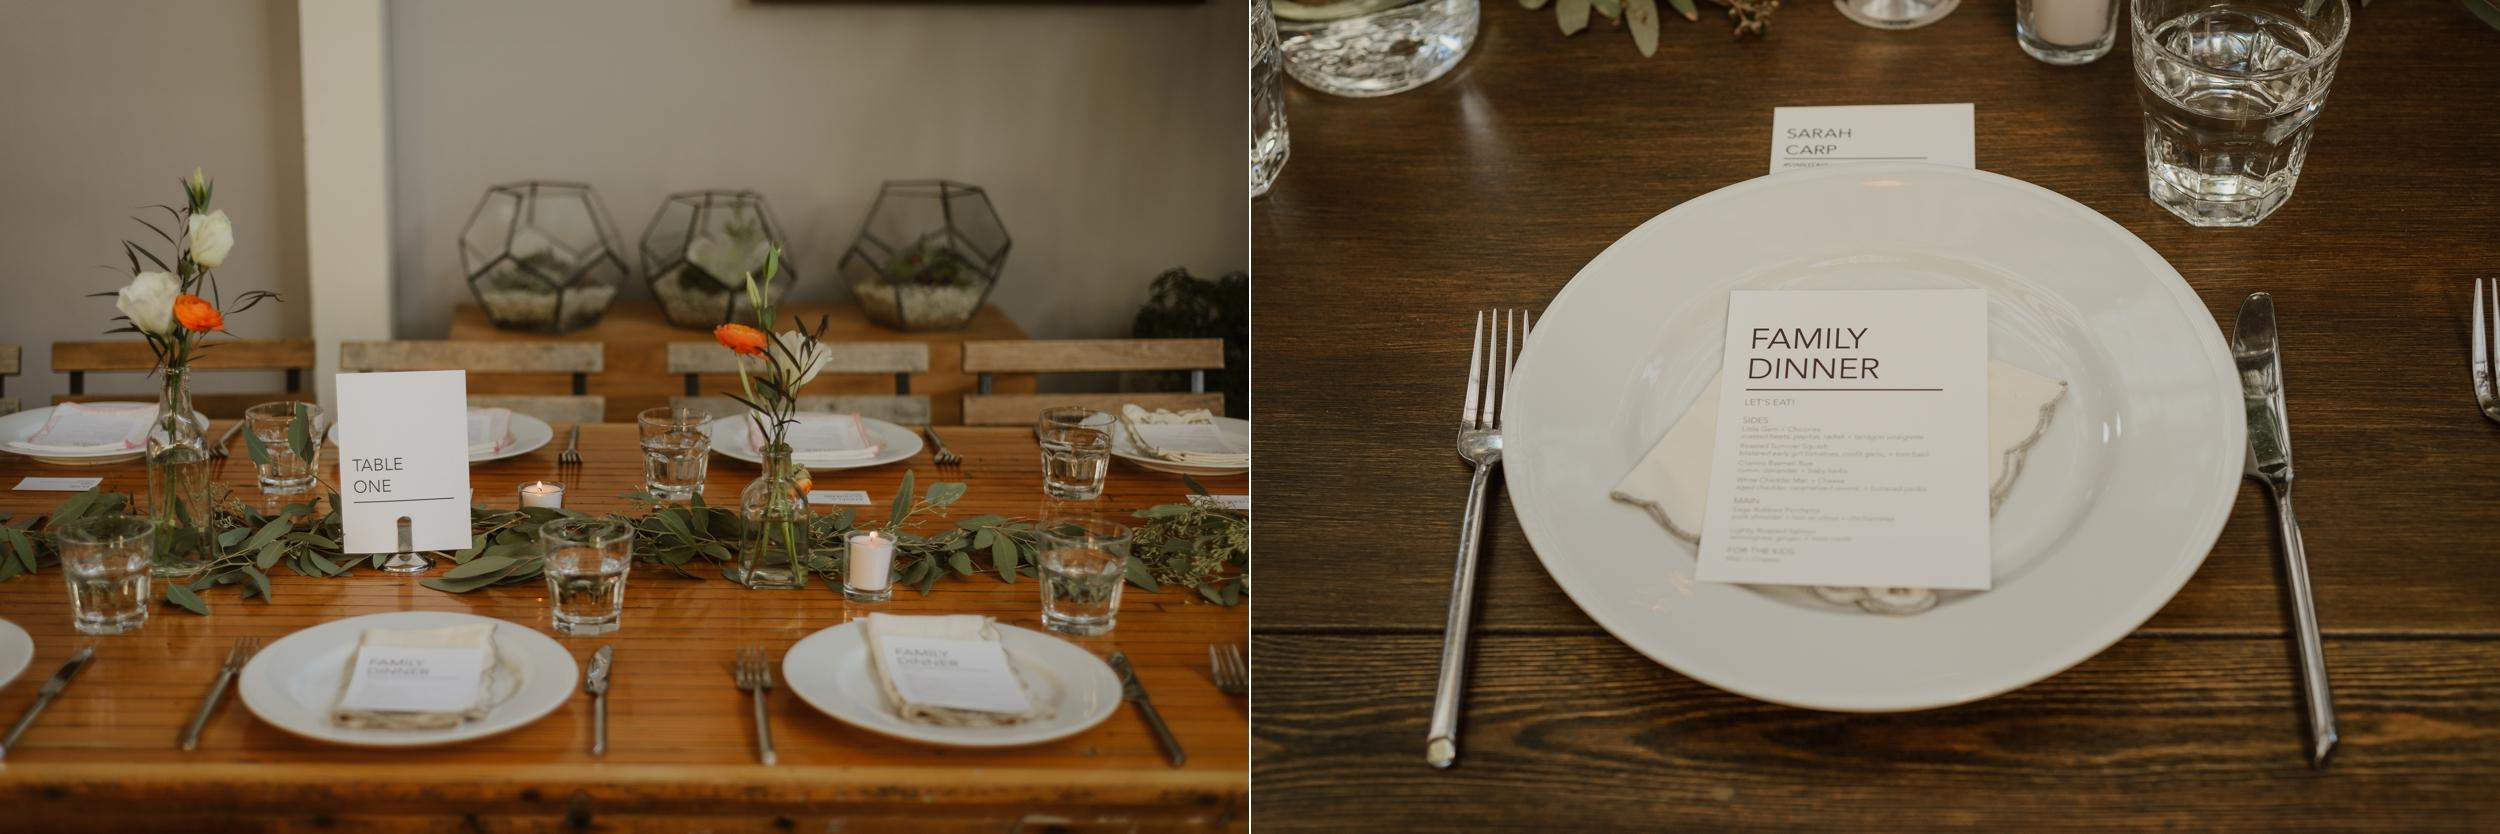 053-53-san-francisco-city-hall-stable-cafe-wedding-vivianchen-064_WEB.jpg